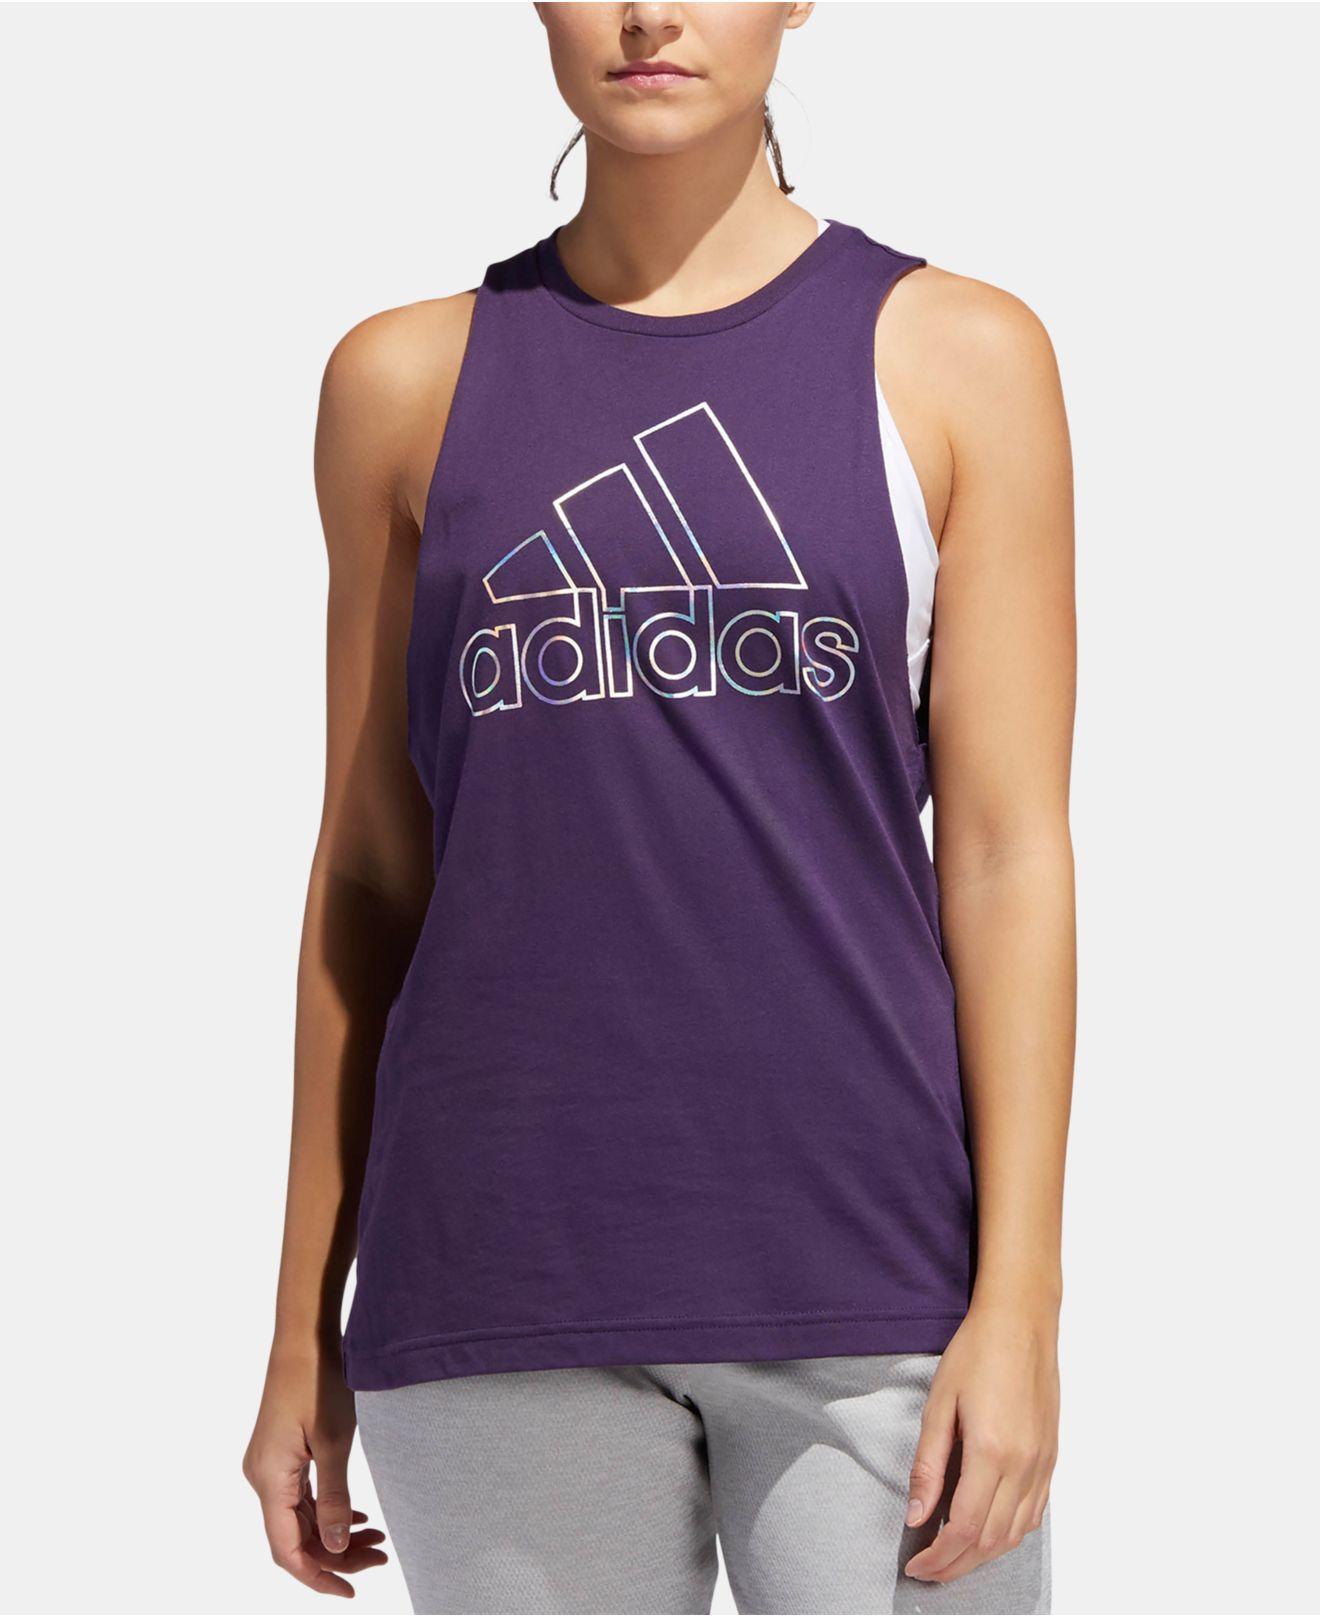 adidas Cotton Outline-logo Tank Top in